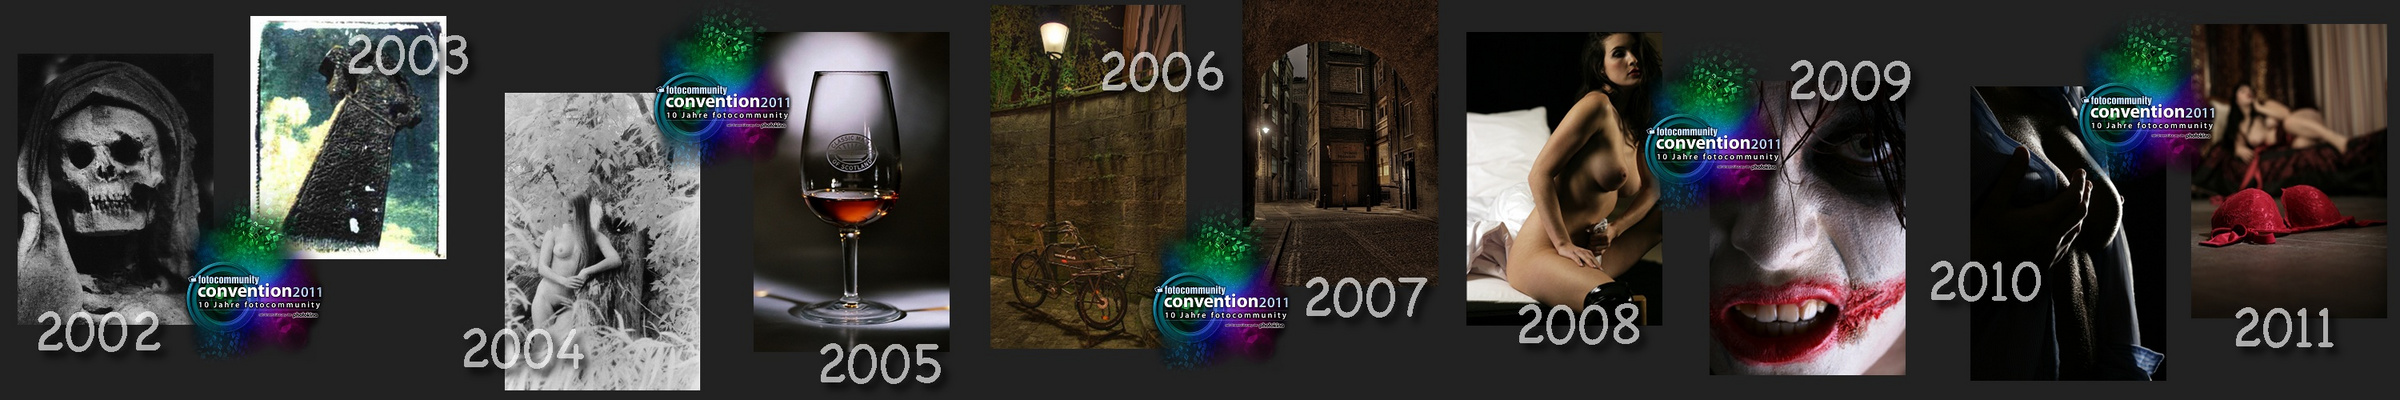 10 Jahre fotocommunity